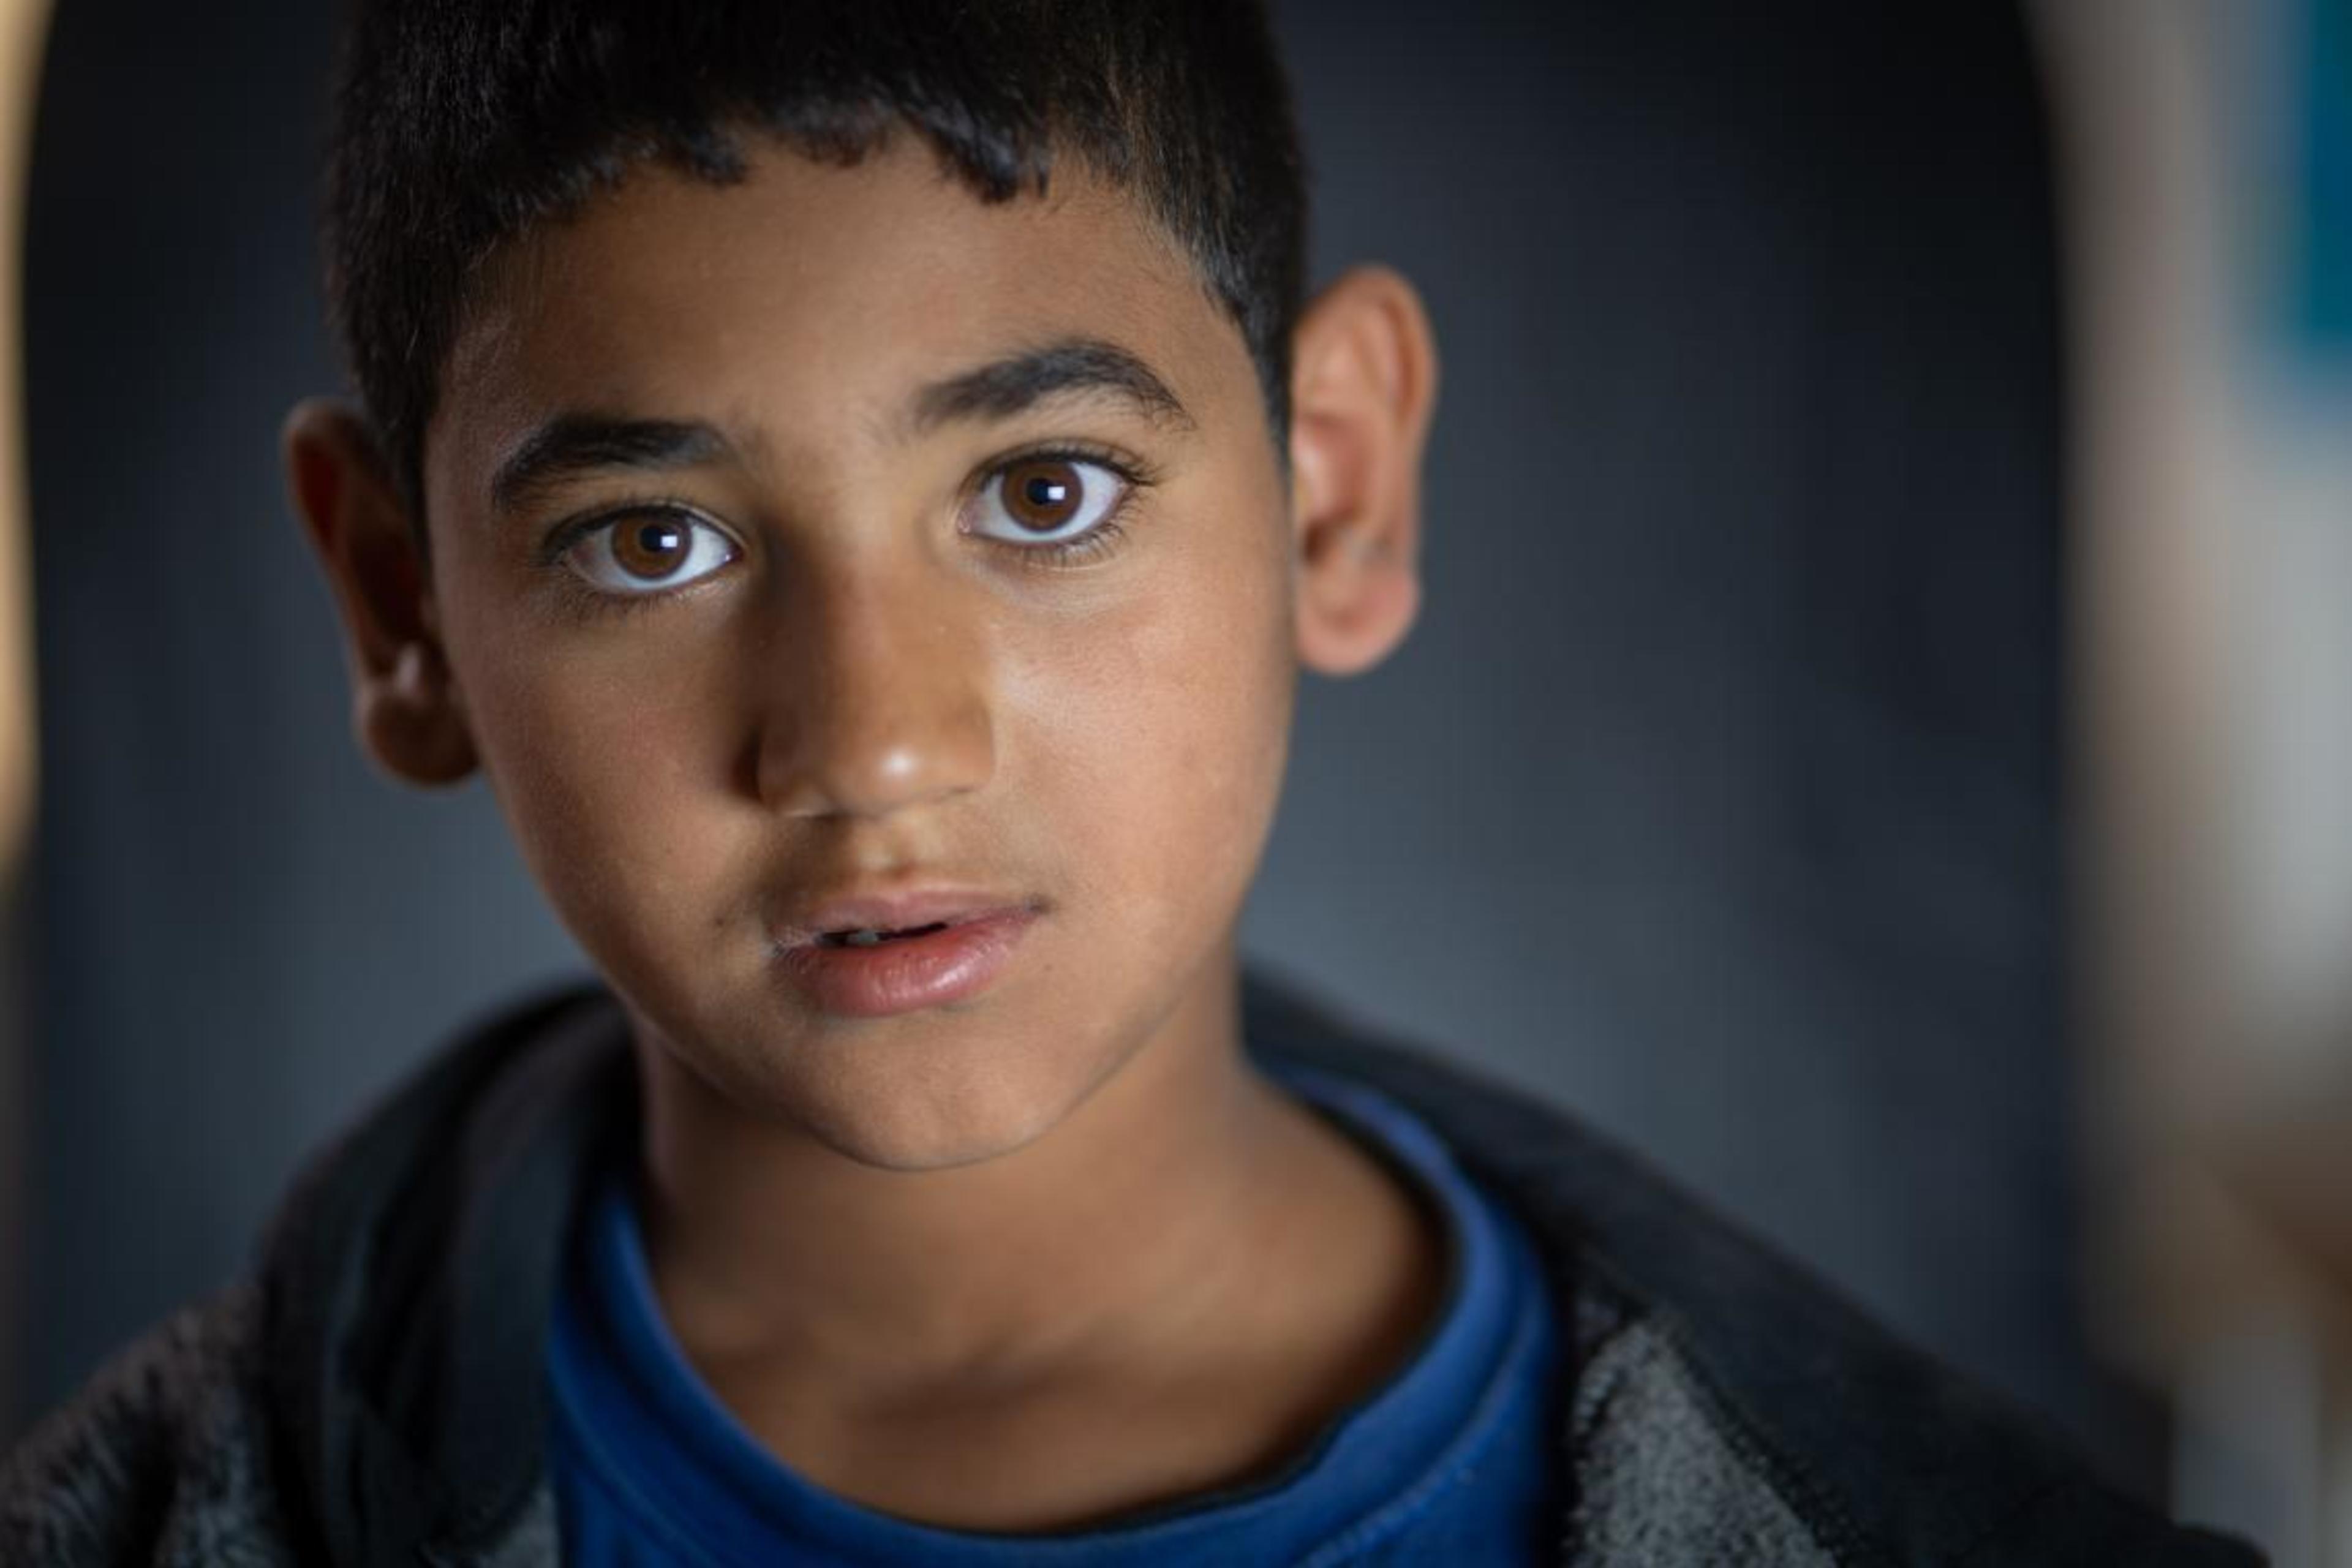 UNICEF/UN0264951/Herwig